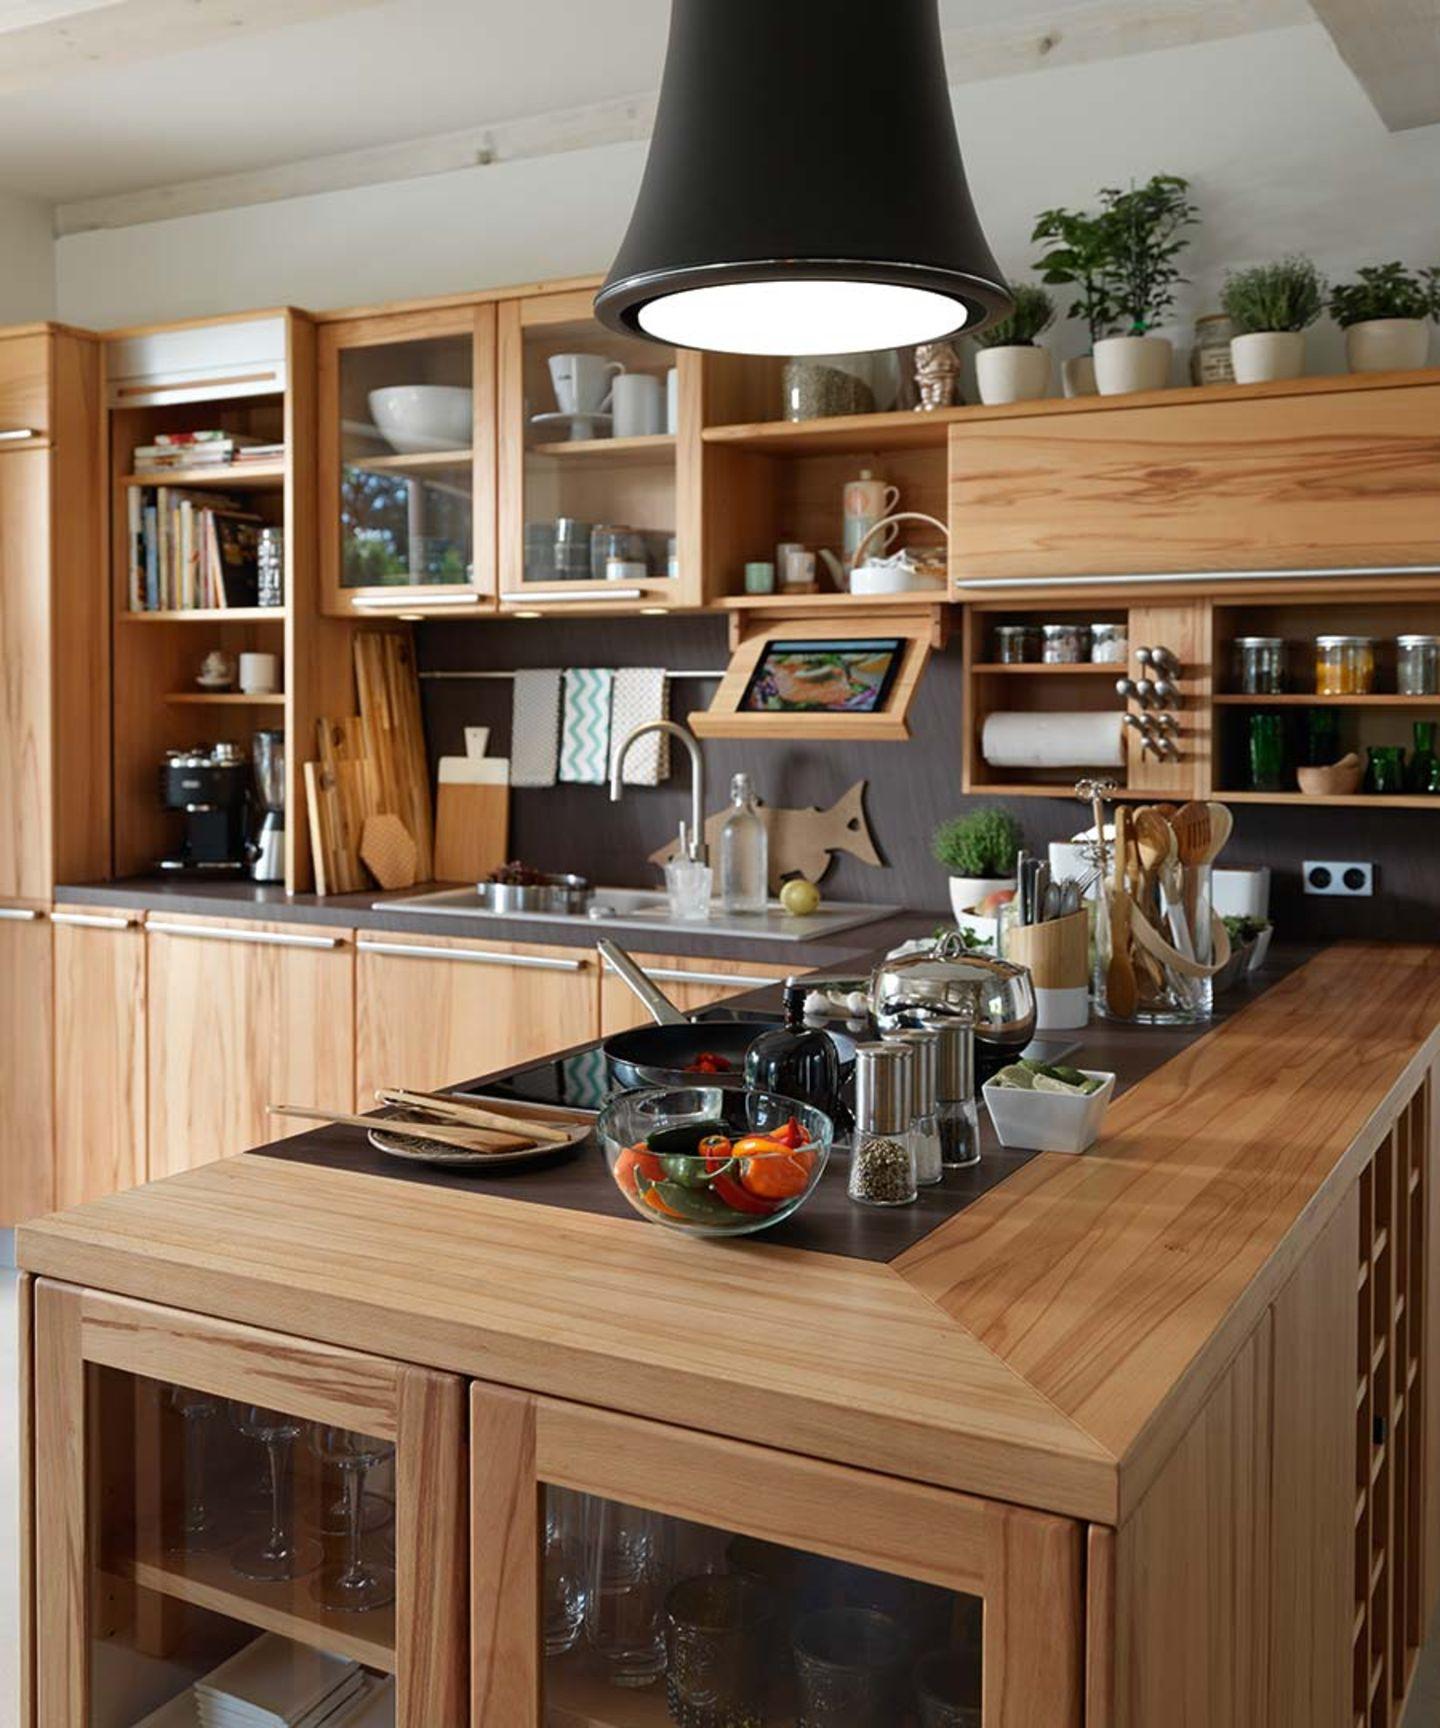 Holzküche rondo mit Naturholz Kochbuchhalter